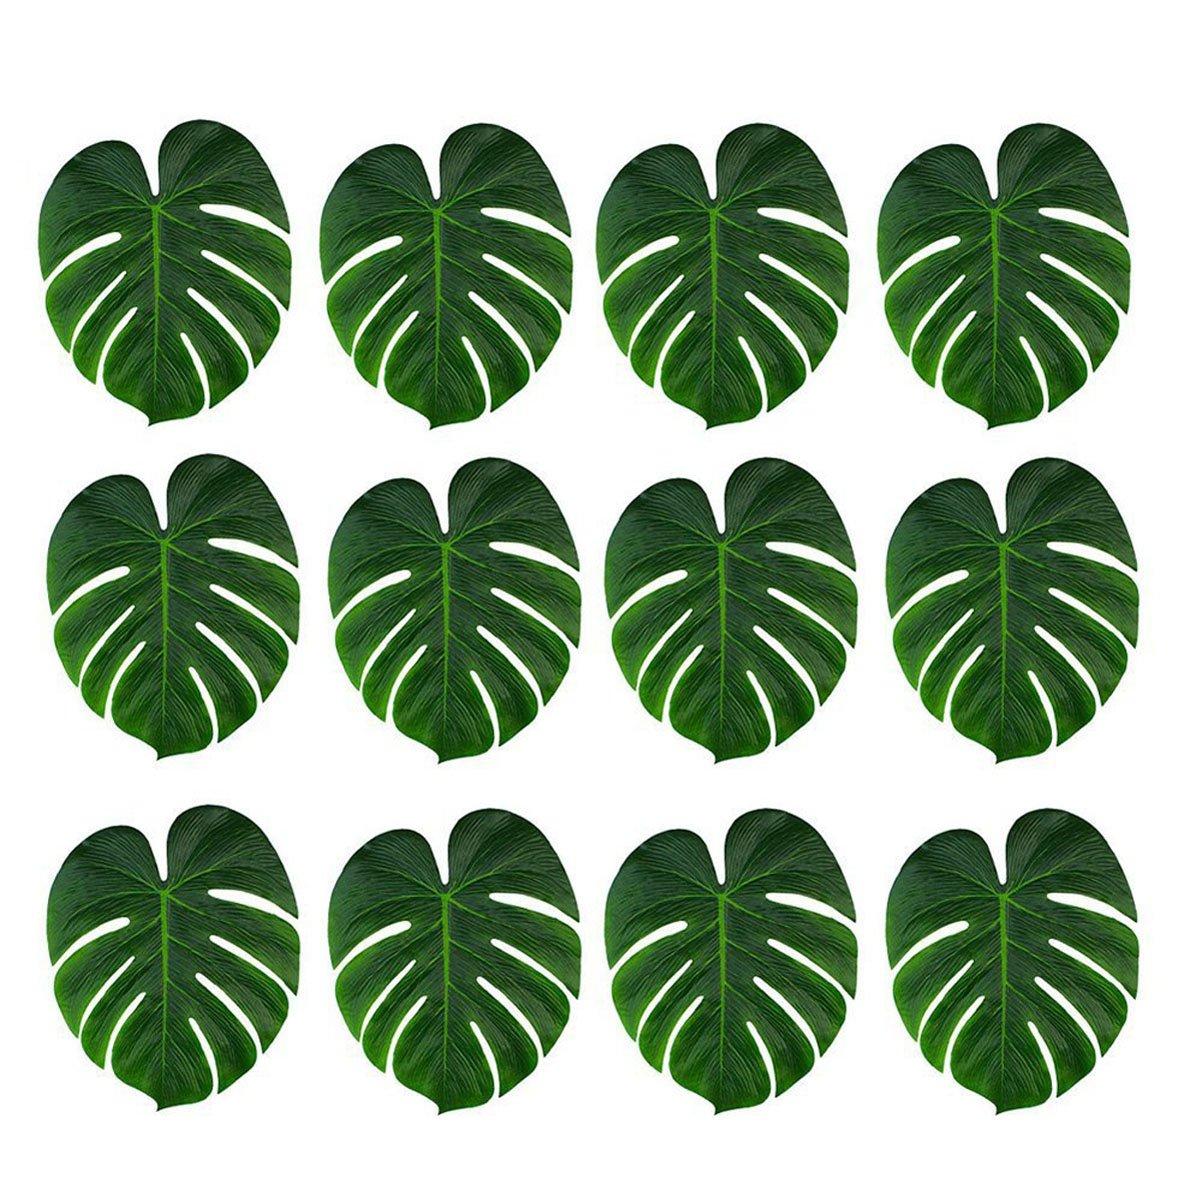 36 pcs人工植物Tropical Palm Monstera Leaves – イミテーションシルクファブリック装飾リーフテーブル装飾アクセサリージャングルビーチテーマプロムandハワイアンルアウパーティーSupplies S (6